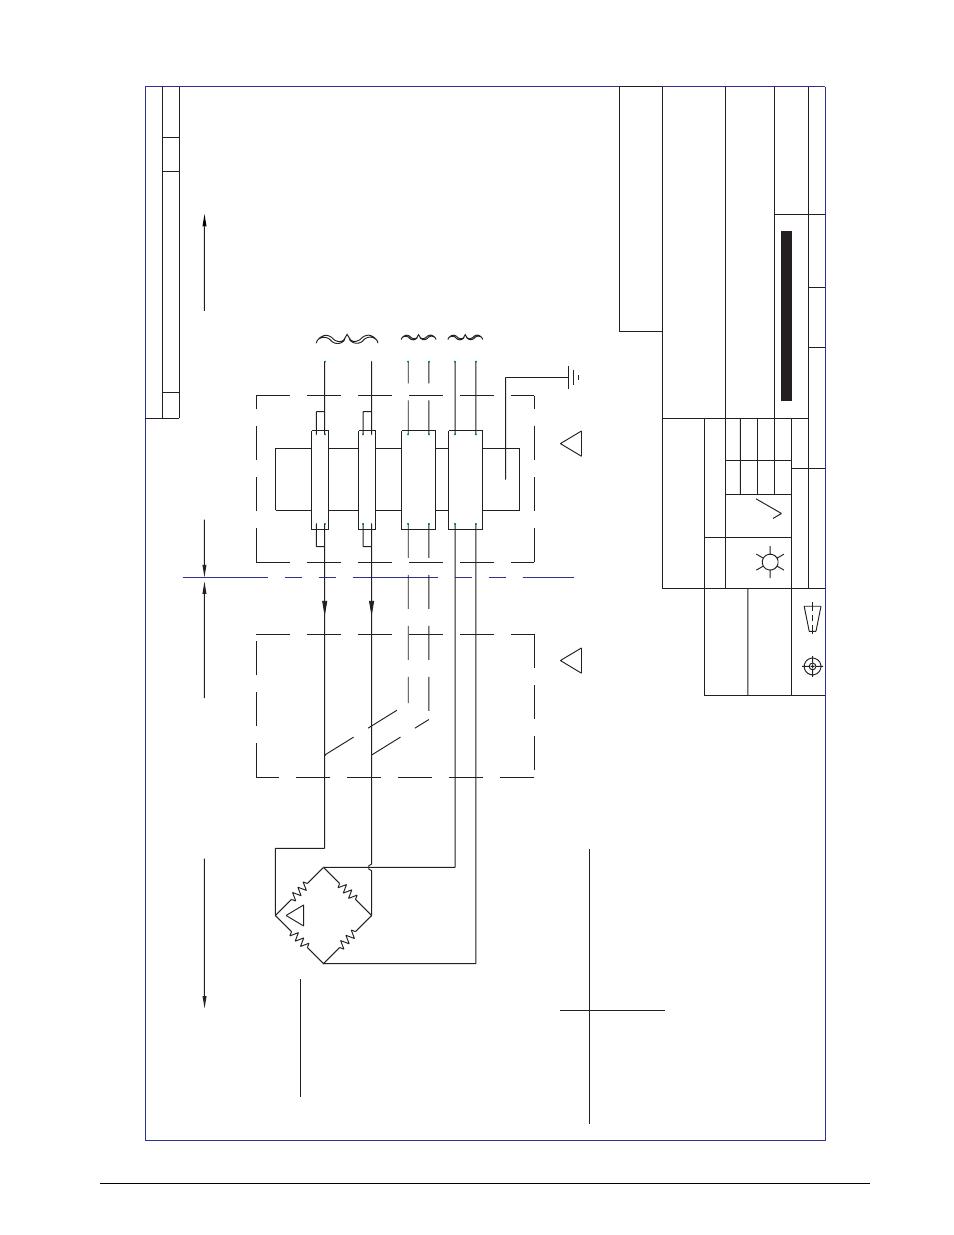 Wiring diagram load cells in hazardous areas | Rice Lake Load Cells - Wiring  for Hazardous Environments User Manual | Page 40 / 45 | Original modeManuals Directory